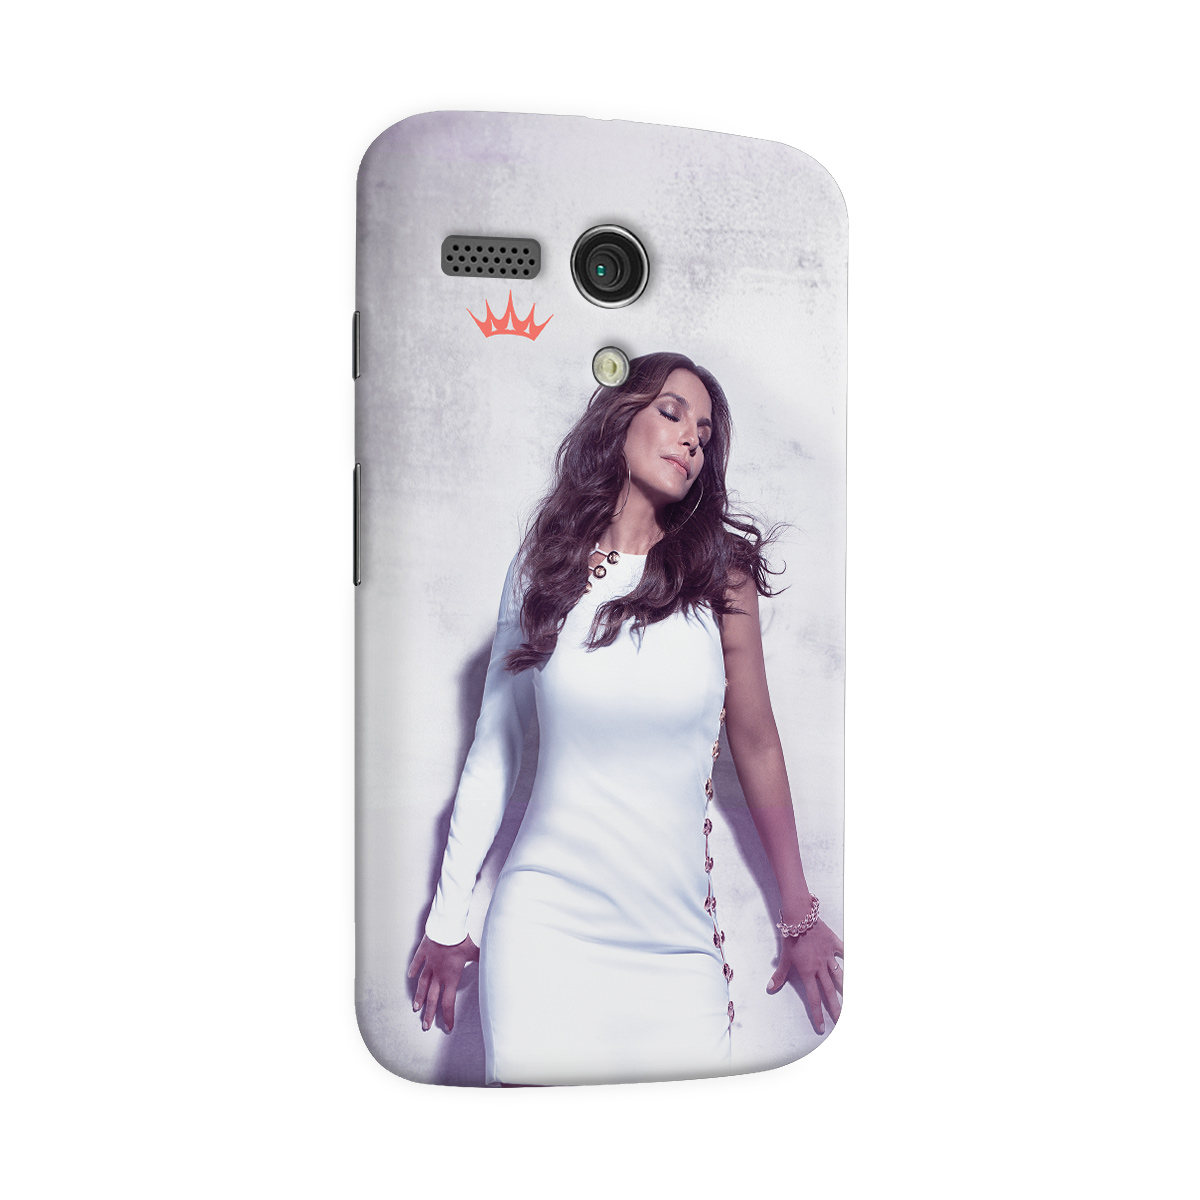 Capa para Motorola Moto G 1 Ivete Sangalo Careless Whisper